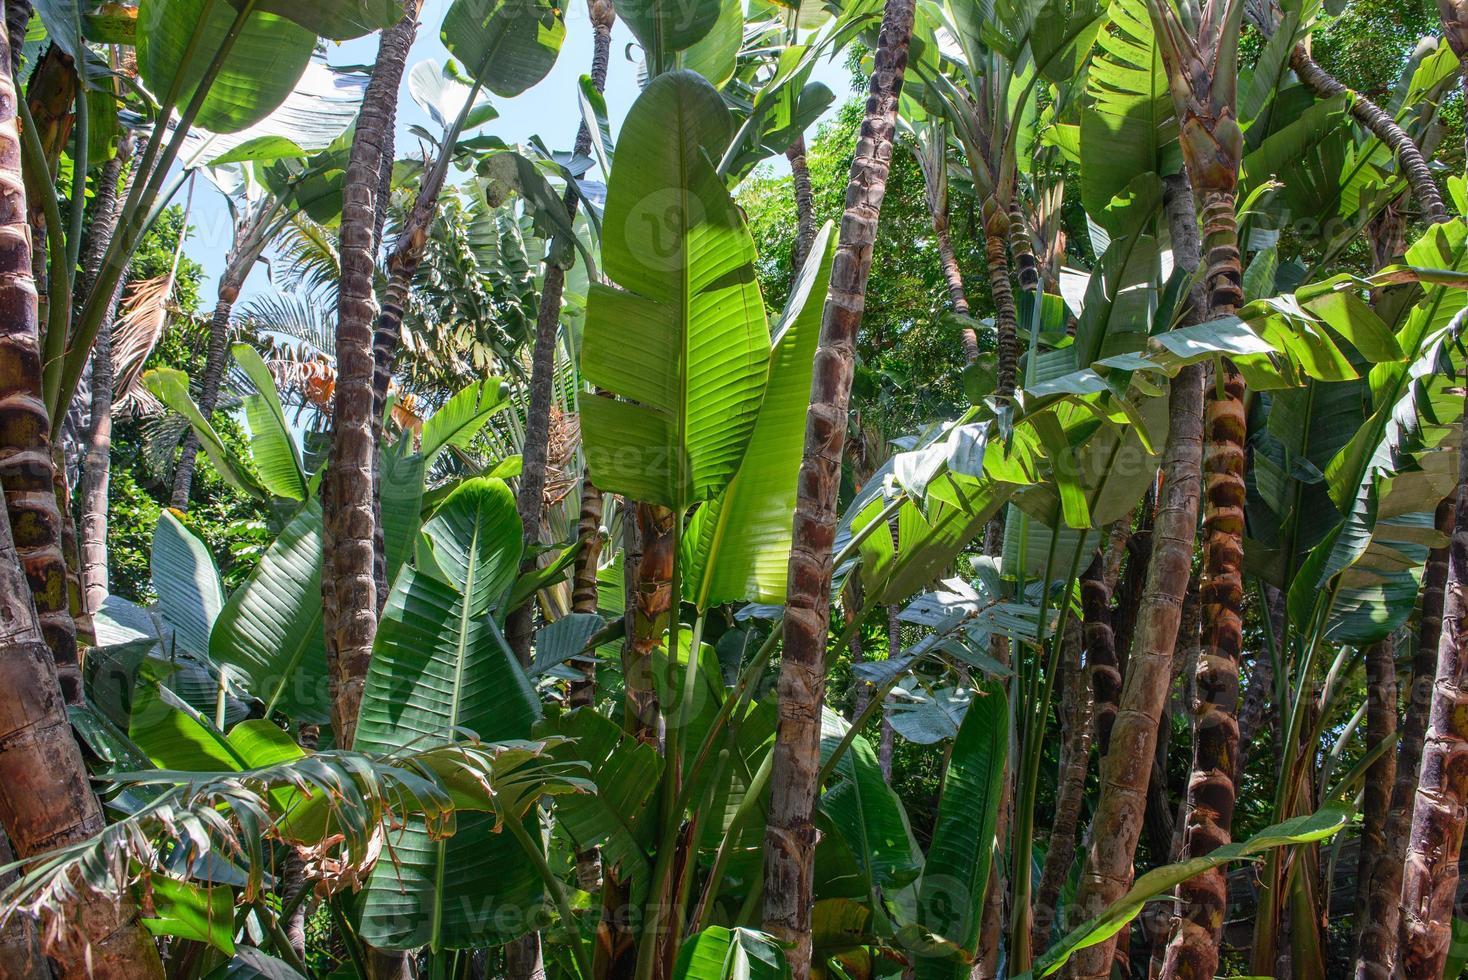 vegetazione tropicale foto